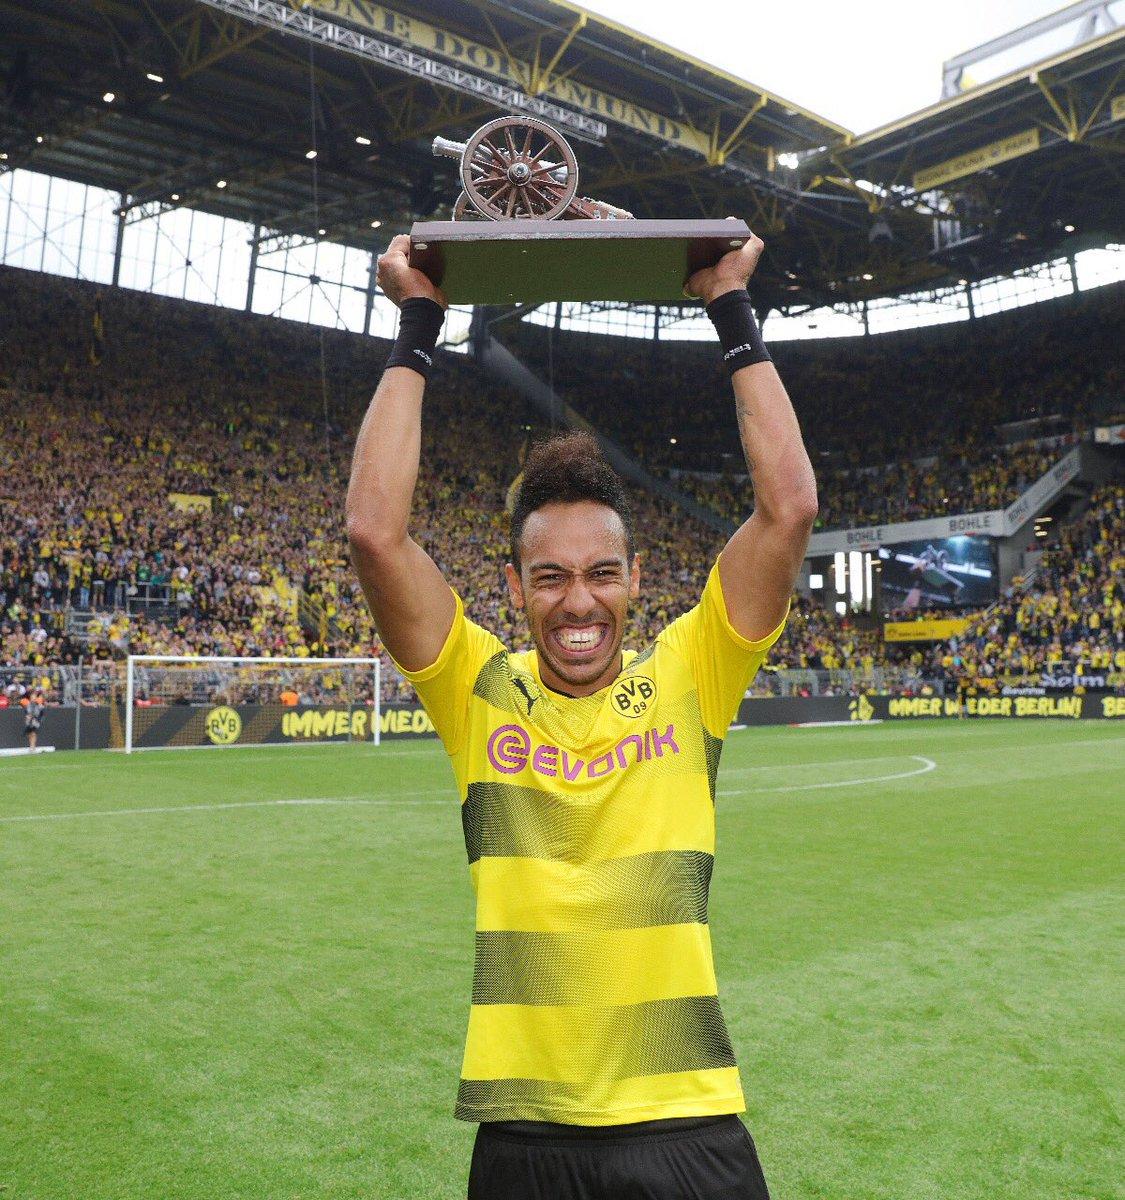 31 goals.   Your 2016/17 #Bundesliga top goalscorer, Pierre-Emerick Aubameyang. (via @BVB)<br>http://pic.twitter.com/TiCanxMaqM